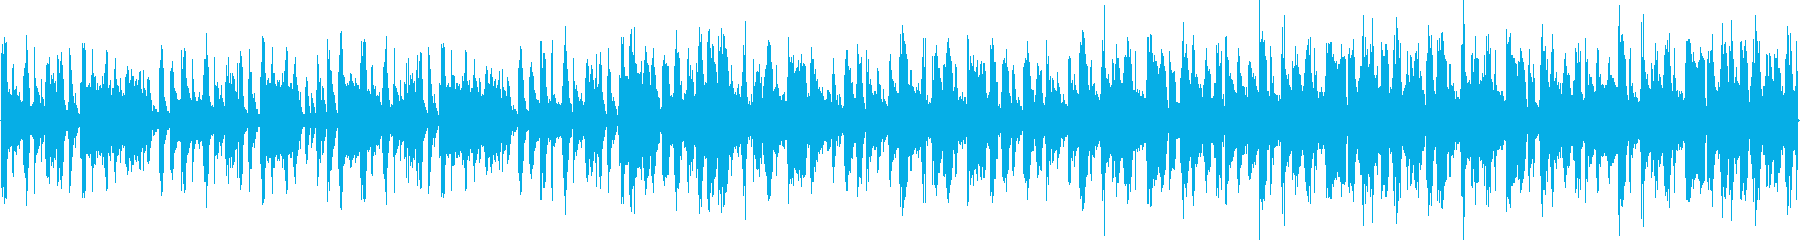 178bpm、Ab-Maj、ラテン調の再生済みの波形